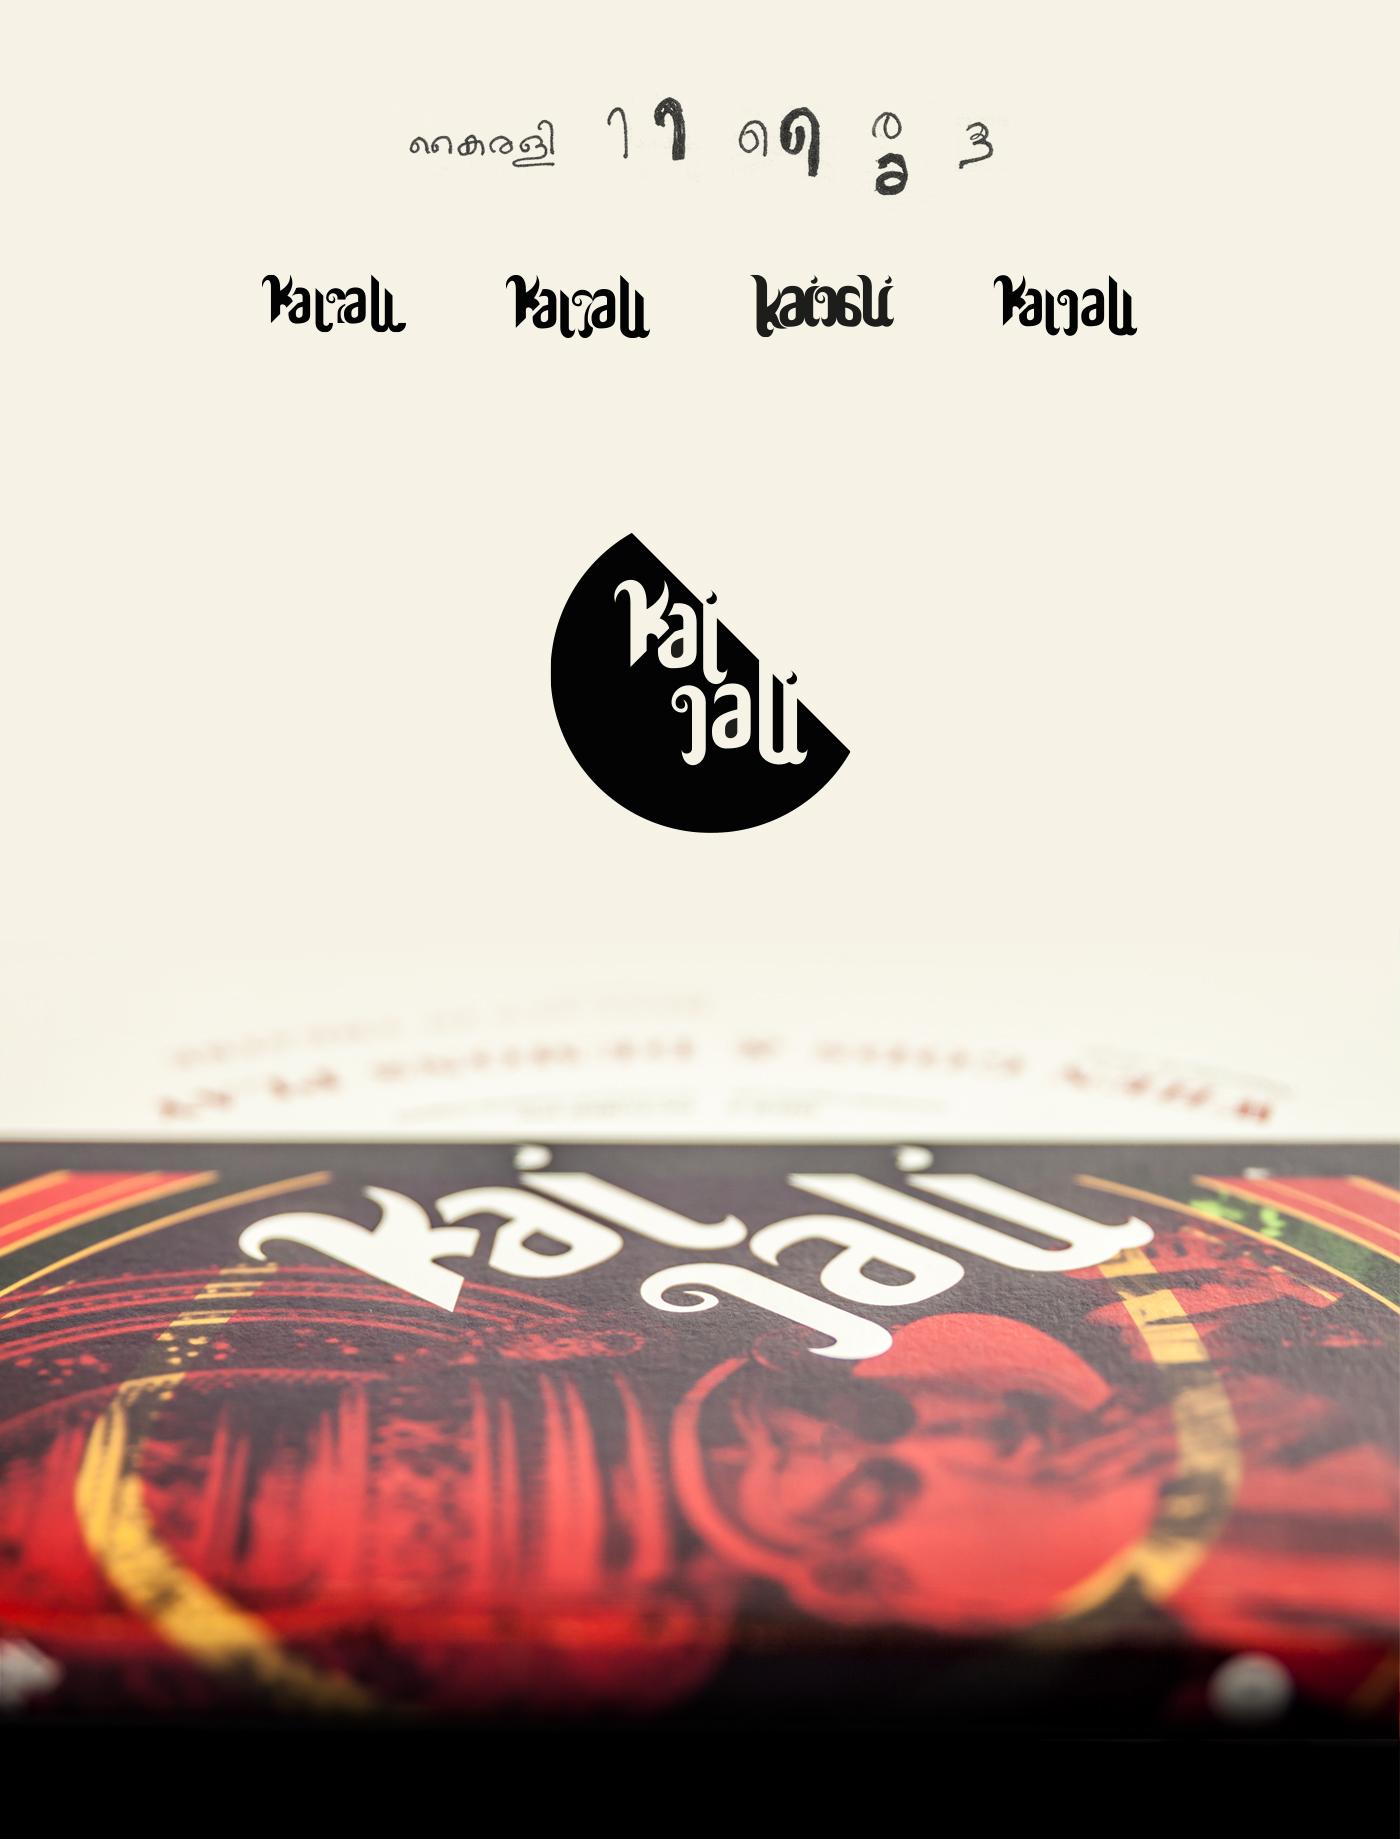 kairali art culture kerala magazine kathakali mudiyettu